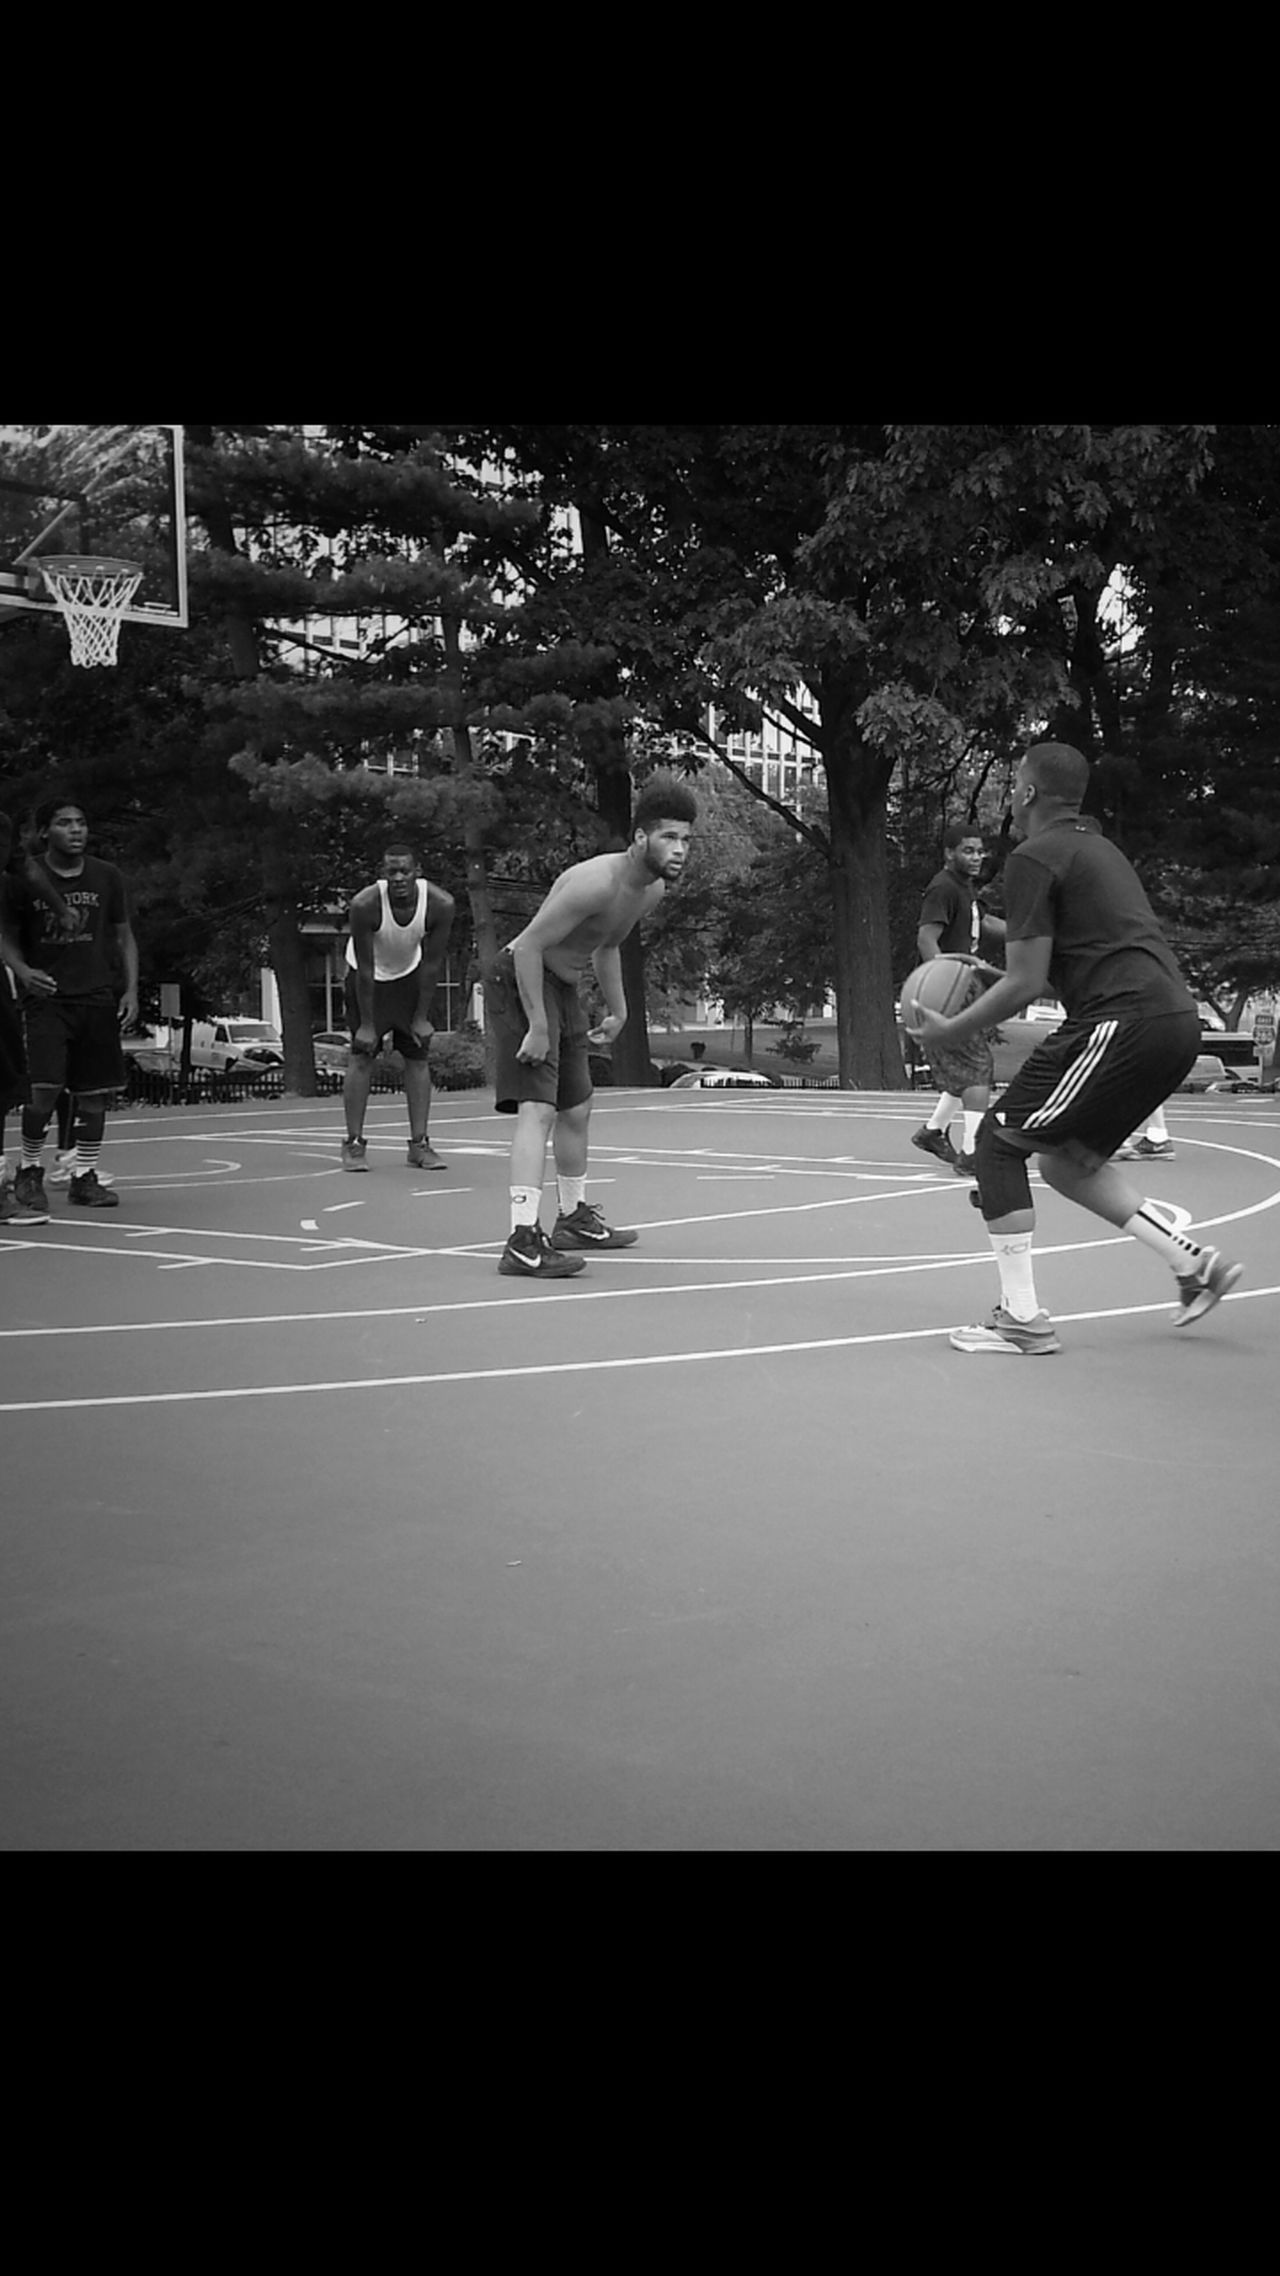 Basketball That Jumpshot Rutgers University LuvTheGame Eyemphotography Eyem Sports Photography Eyem Best Shots - Black + White